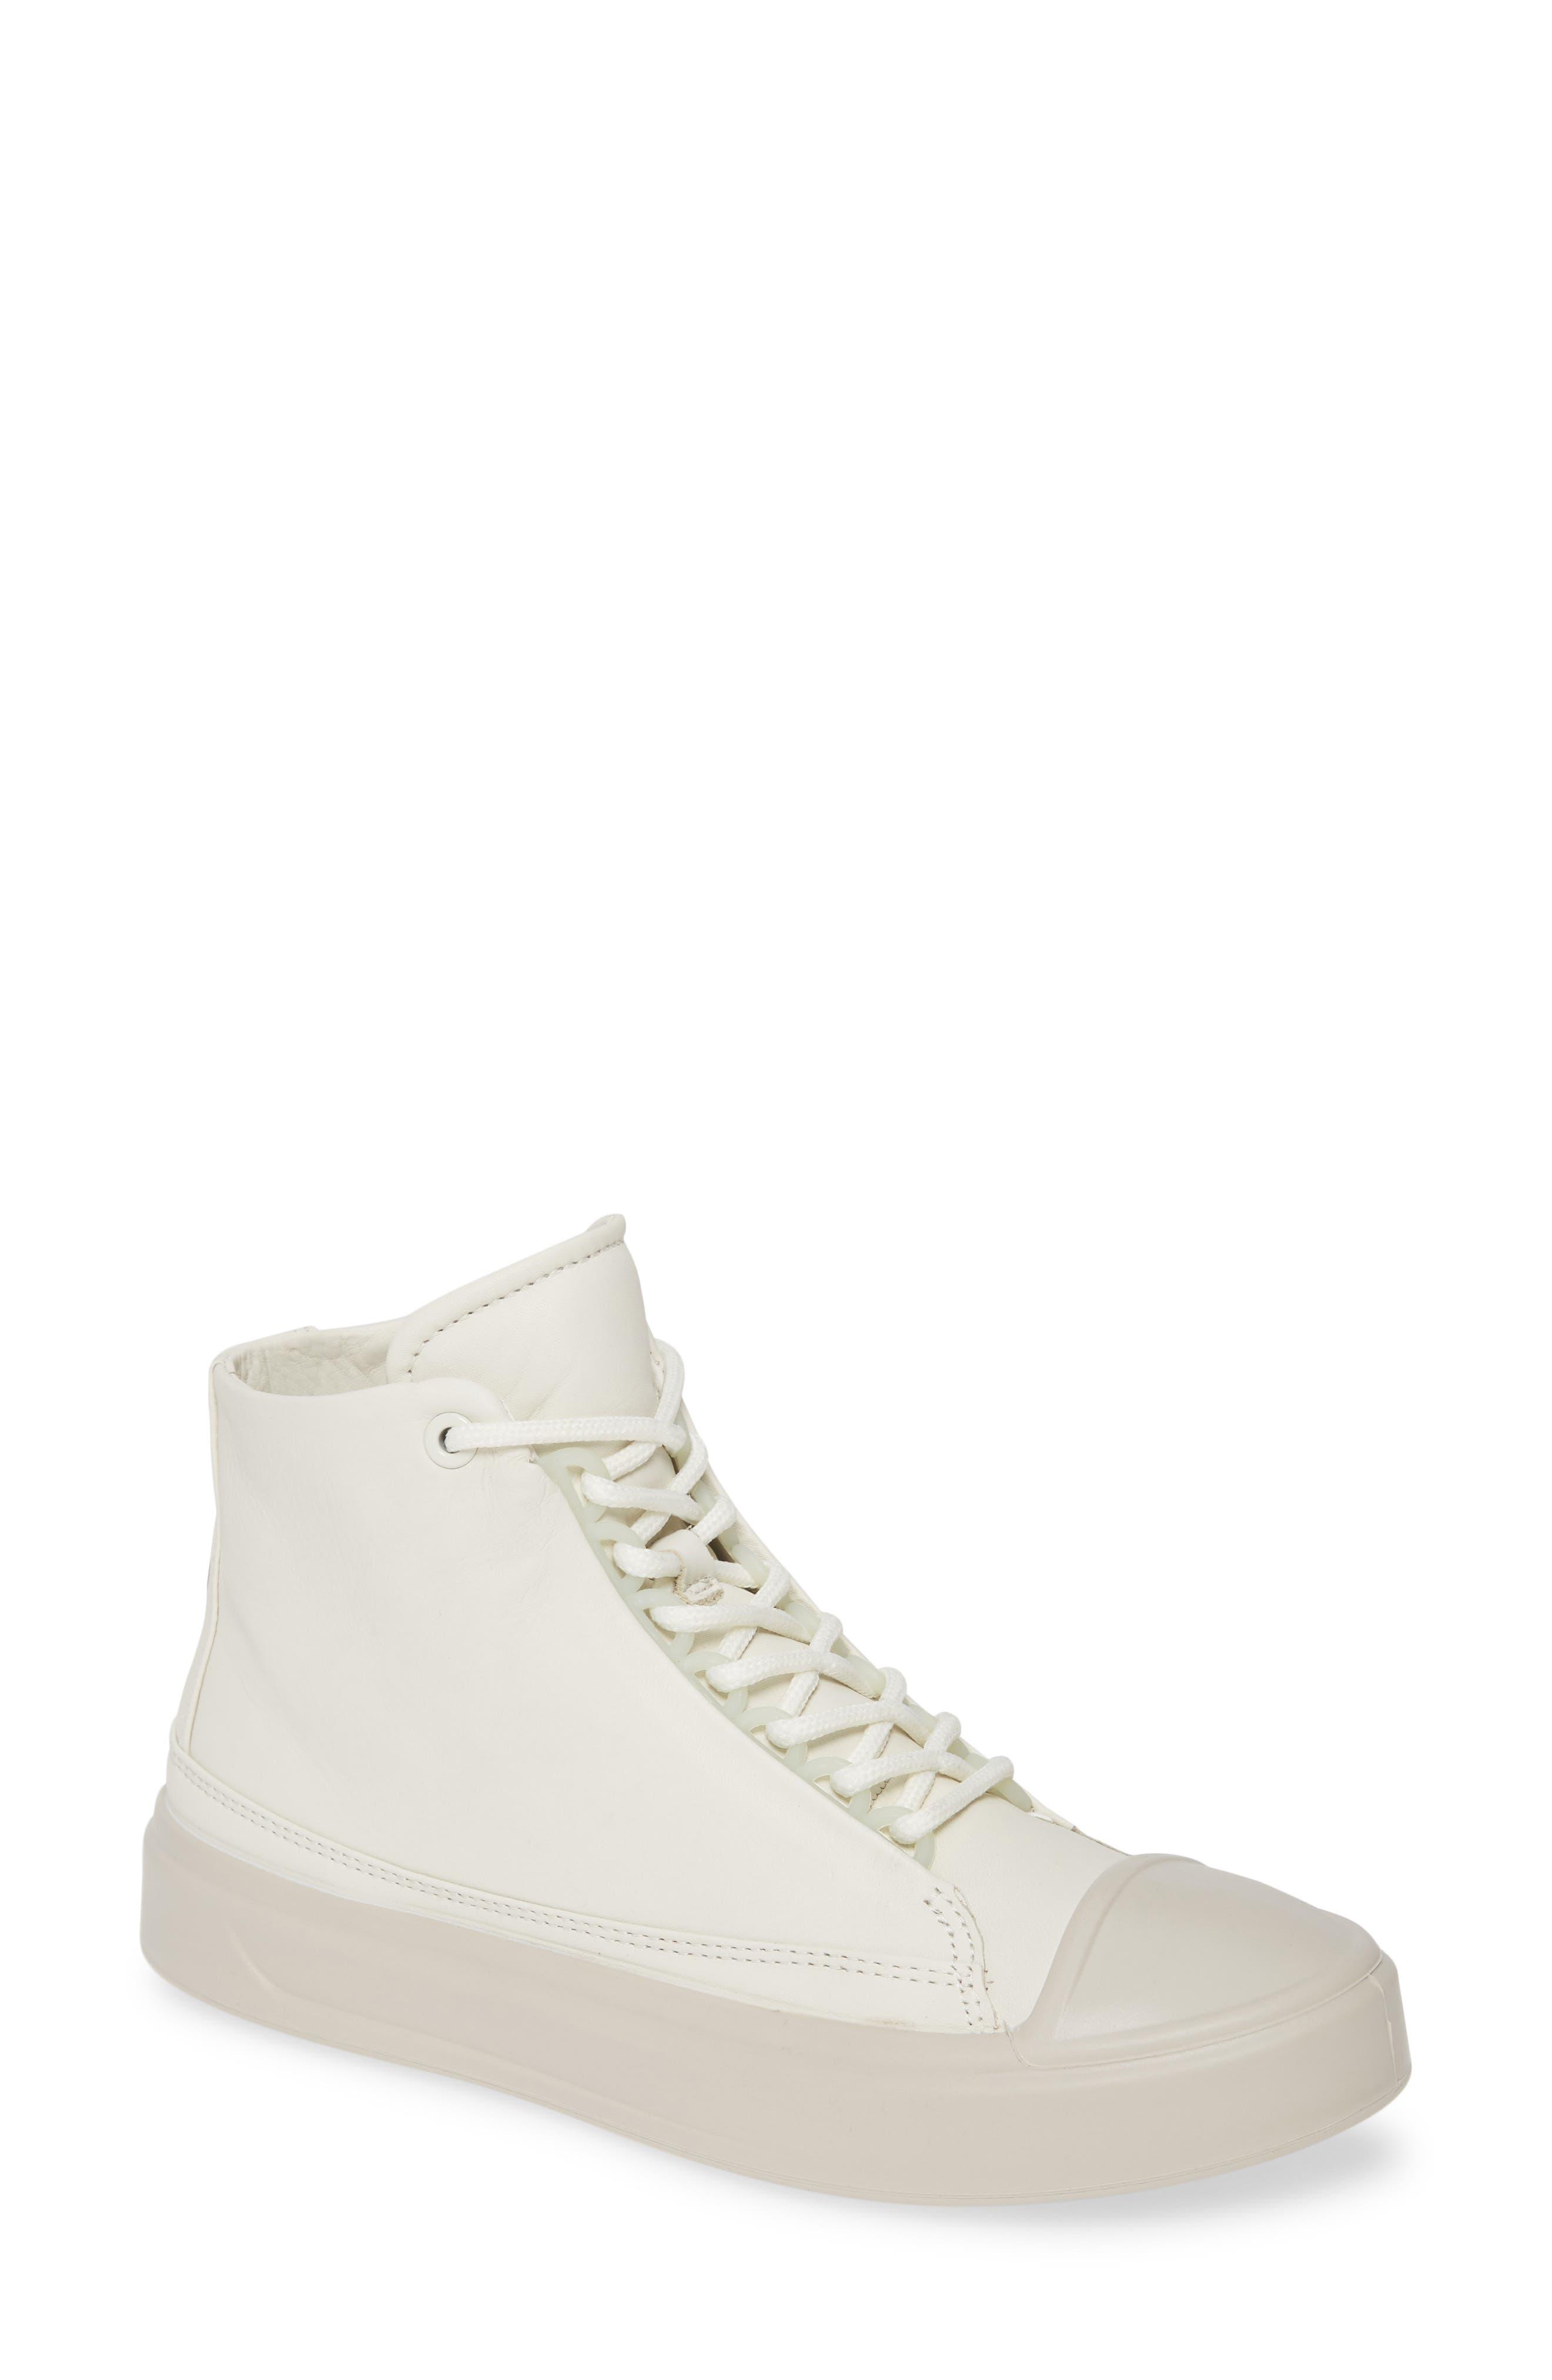 Ecco Flexure Cap Toe High Top Sneaker, White